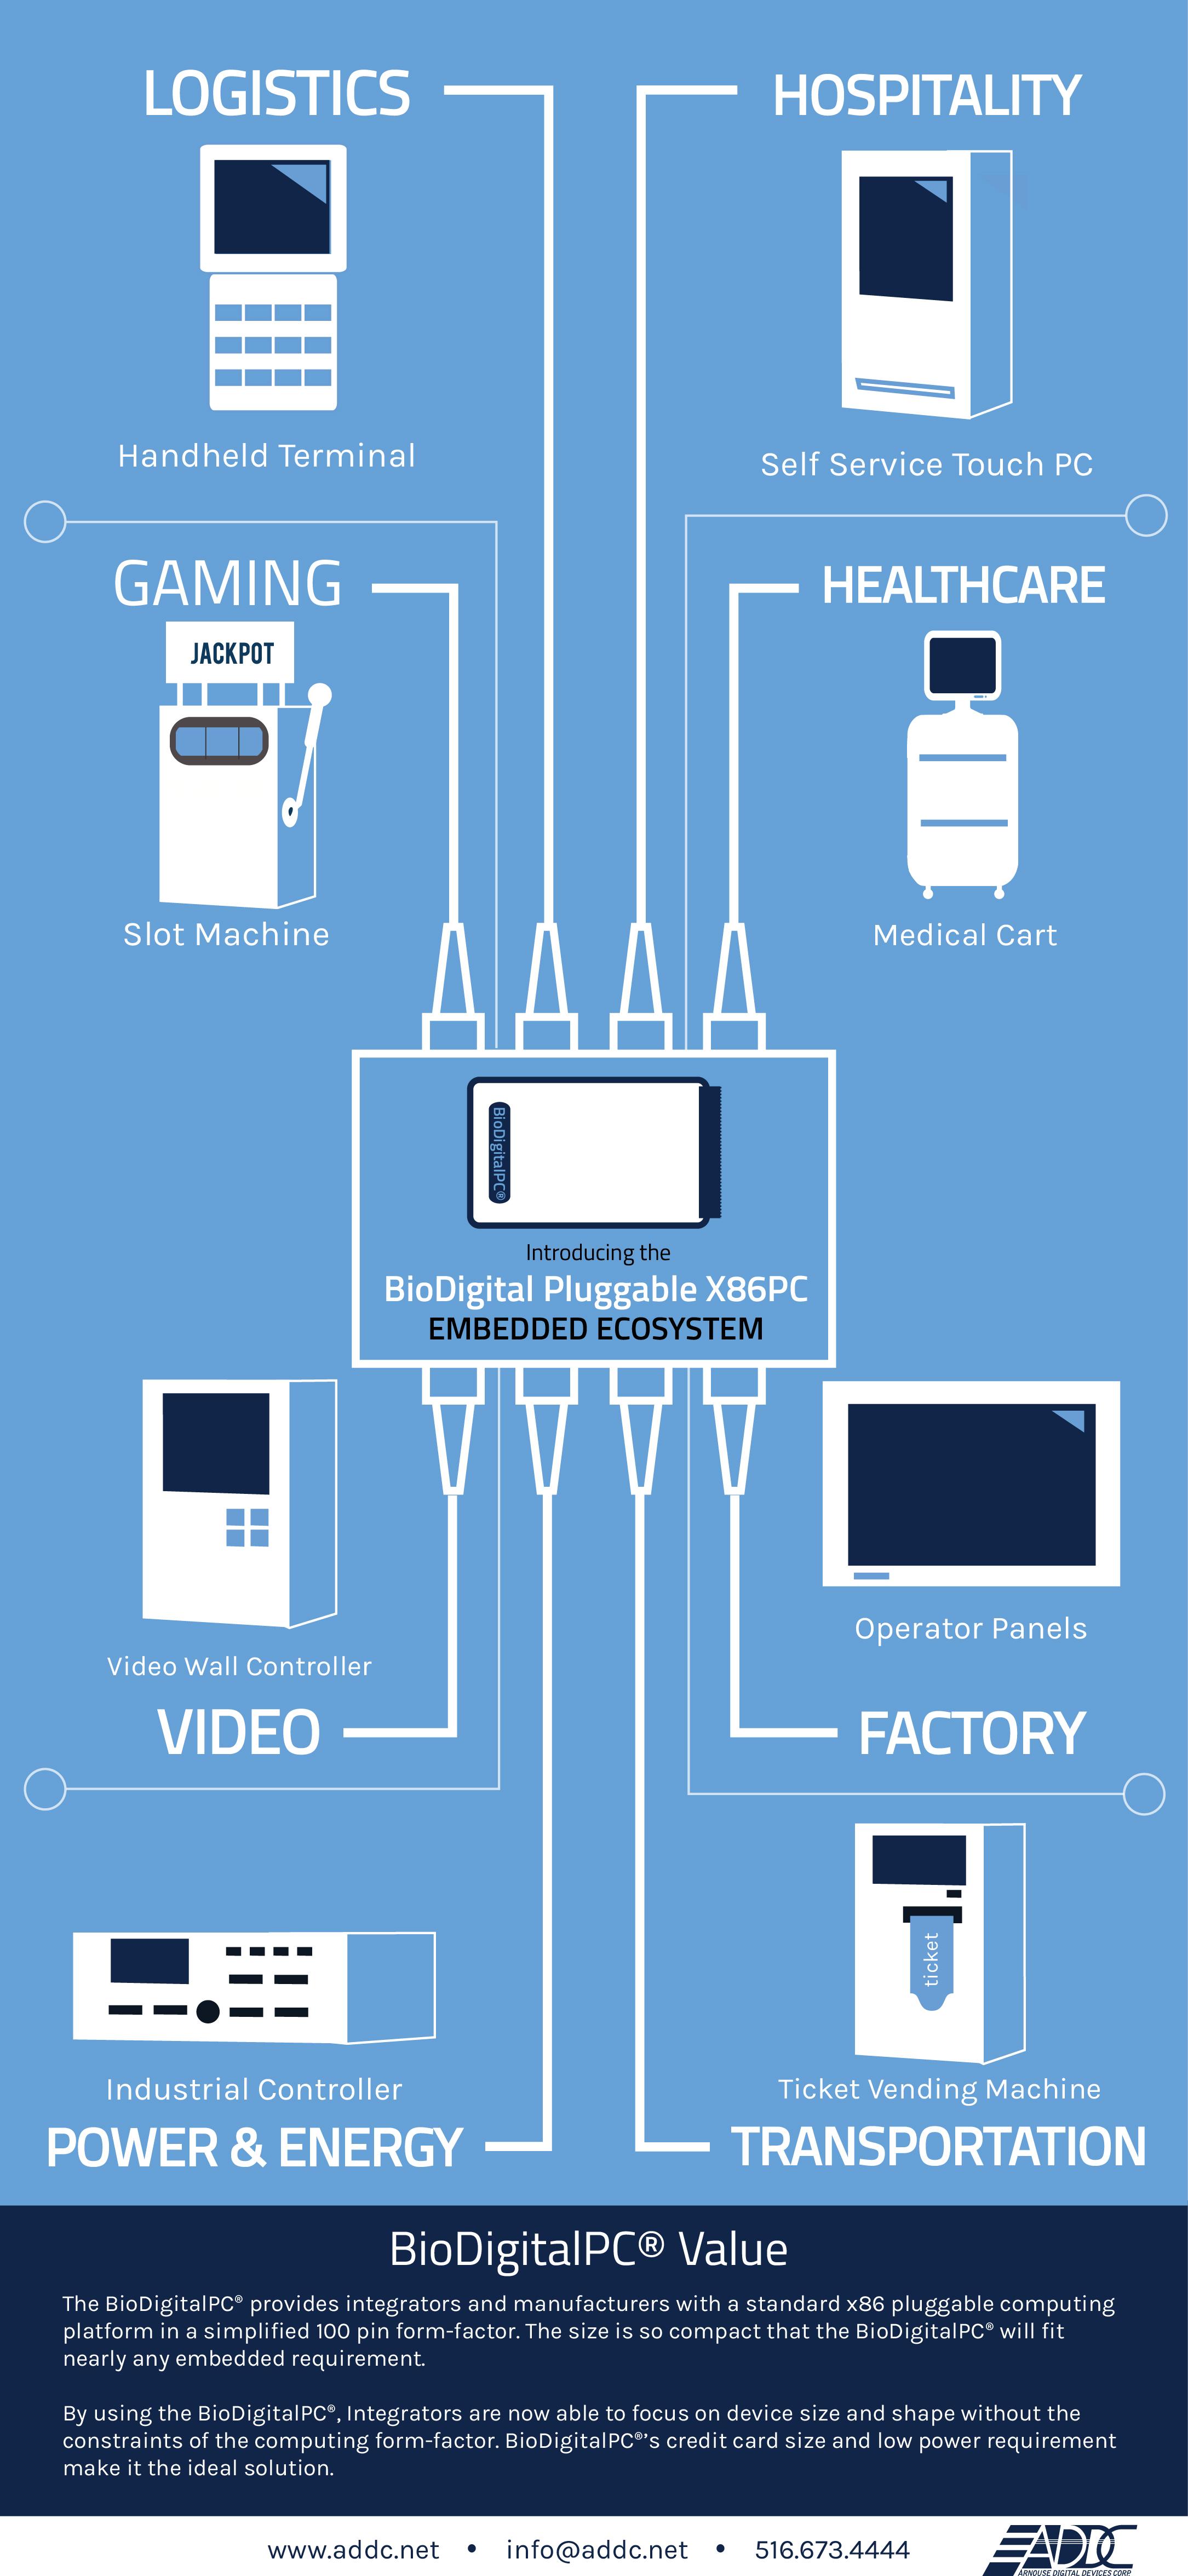 Arnouse Digital Devices - Pluggable Computing Platform - BioDigitalPC®